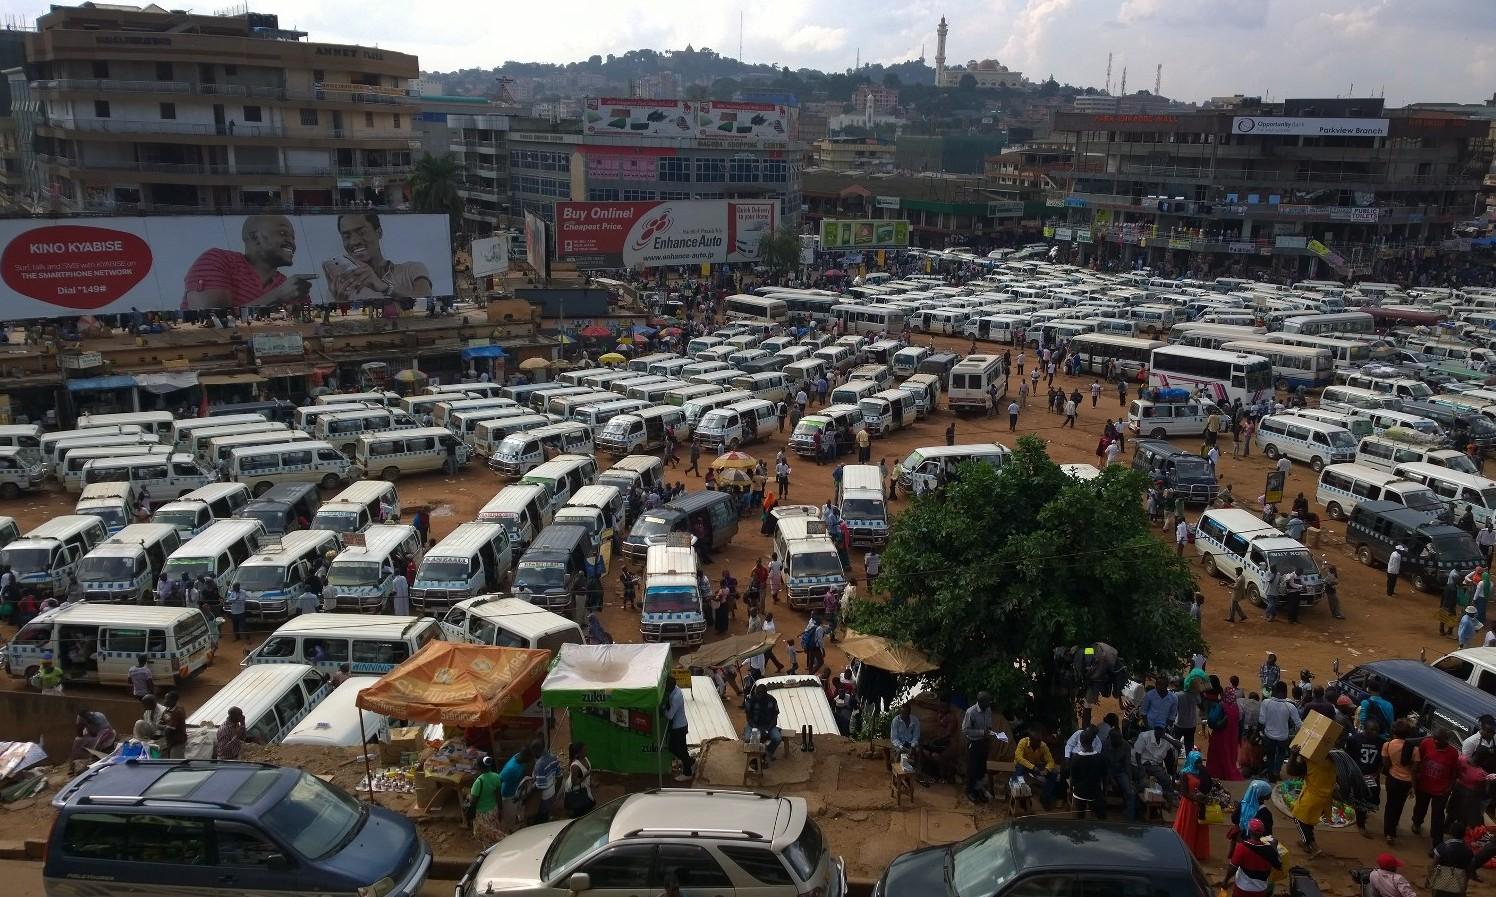 Zapiski z drogi: Kampala